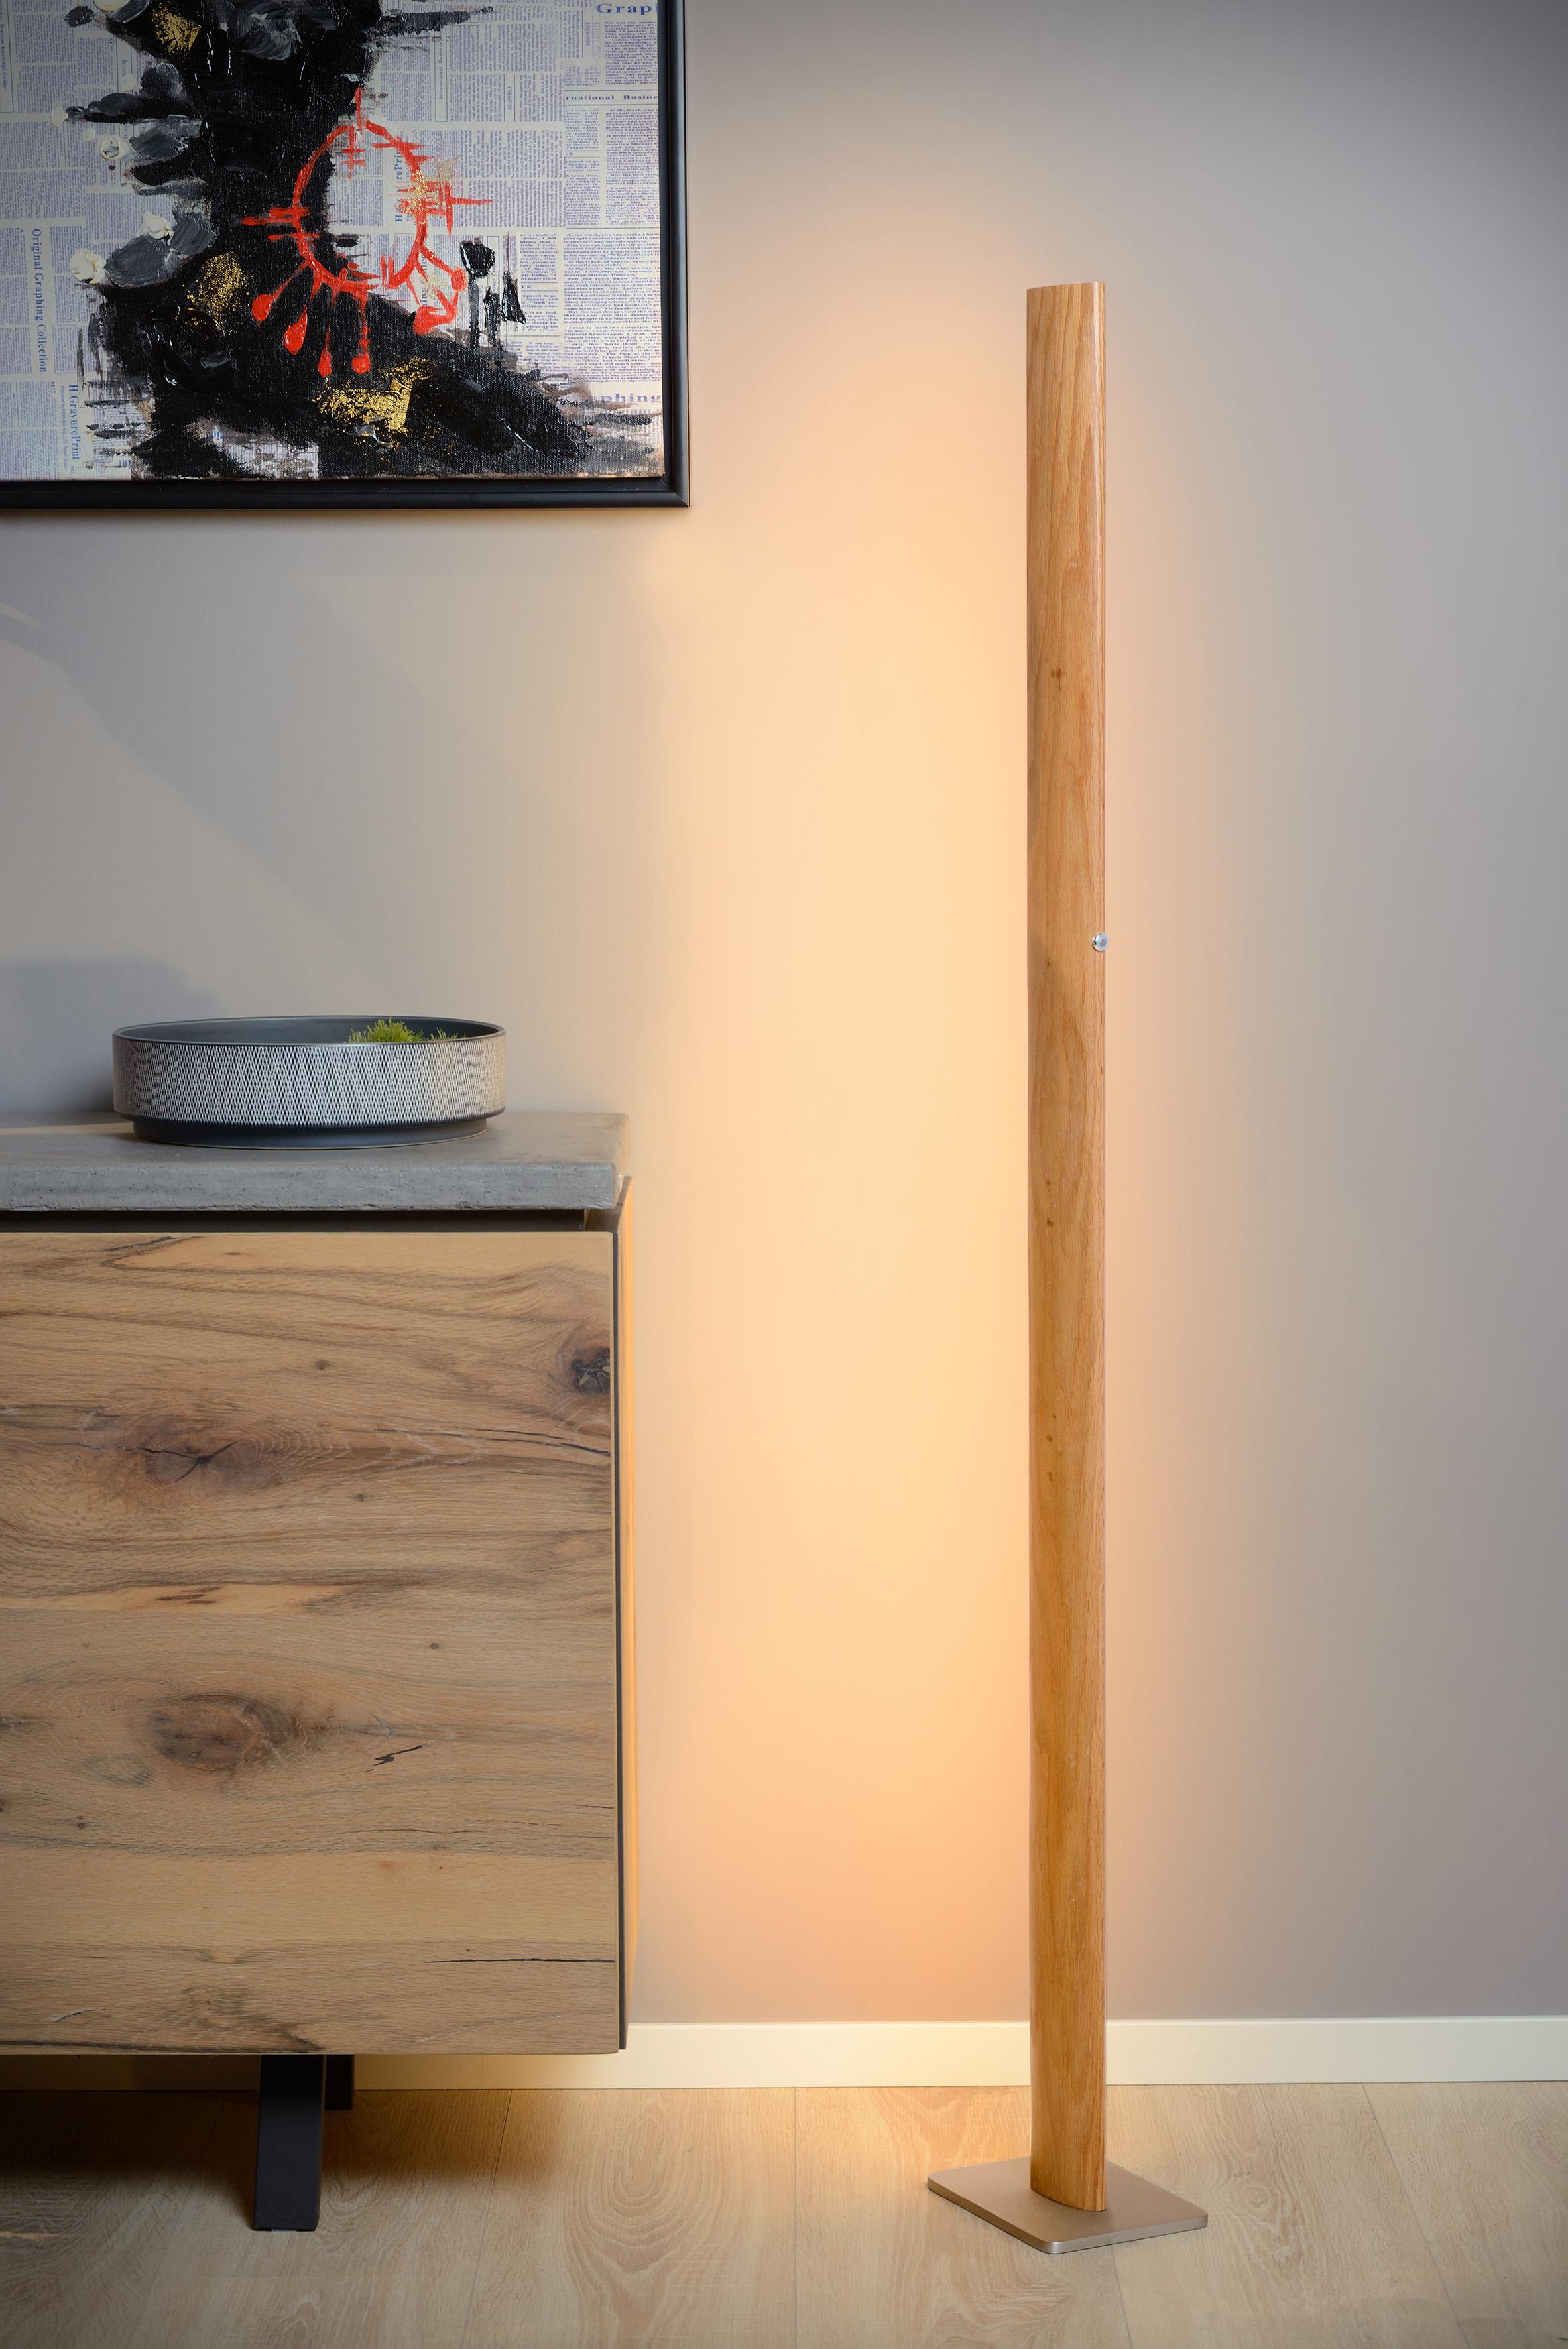 Sytze Stehlampe Led Dim 1x30w 3000k Helles Holz